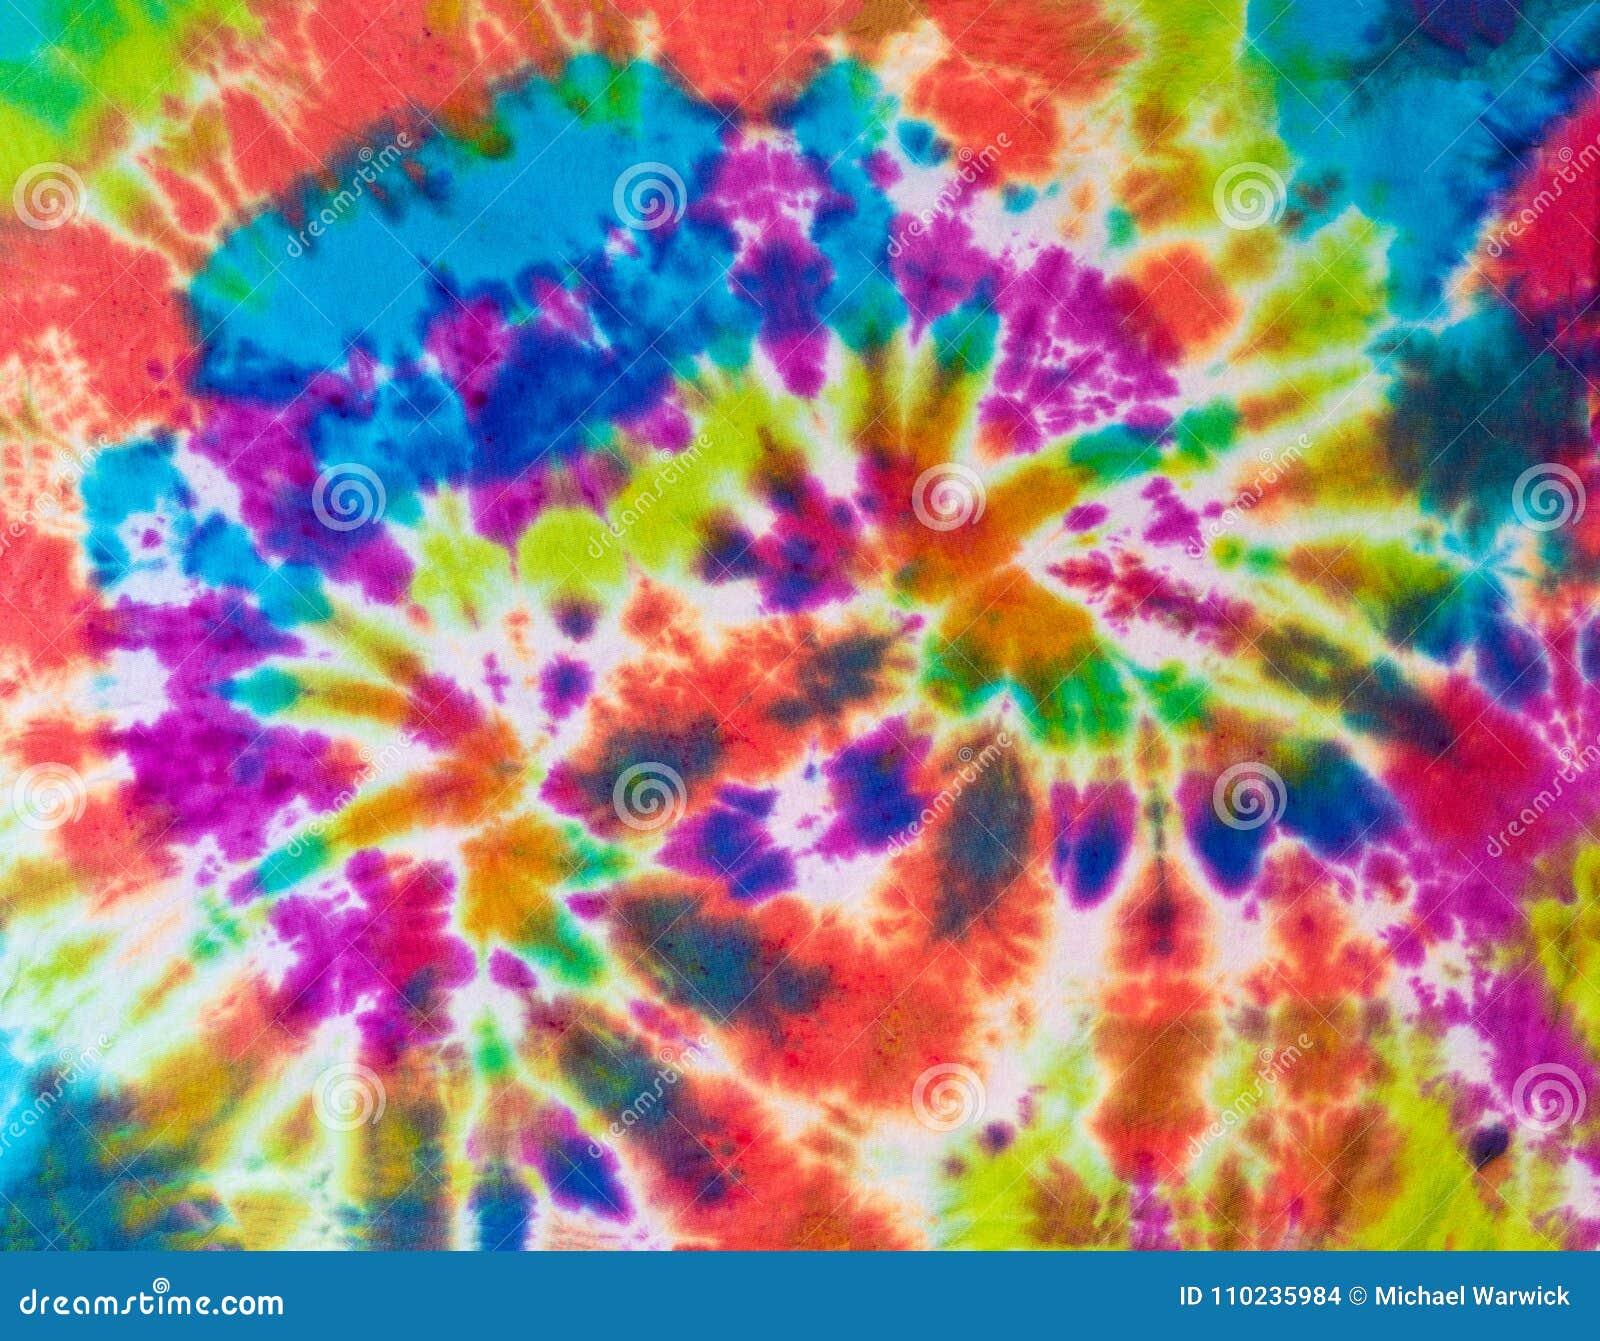 Buntes abstraktes Bindungs-Färbungs-Muster-Design in den mehrfachen Farben